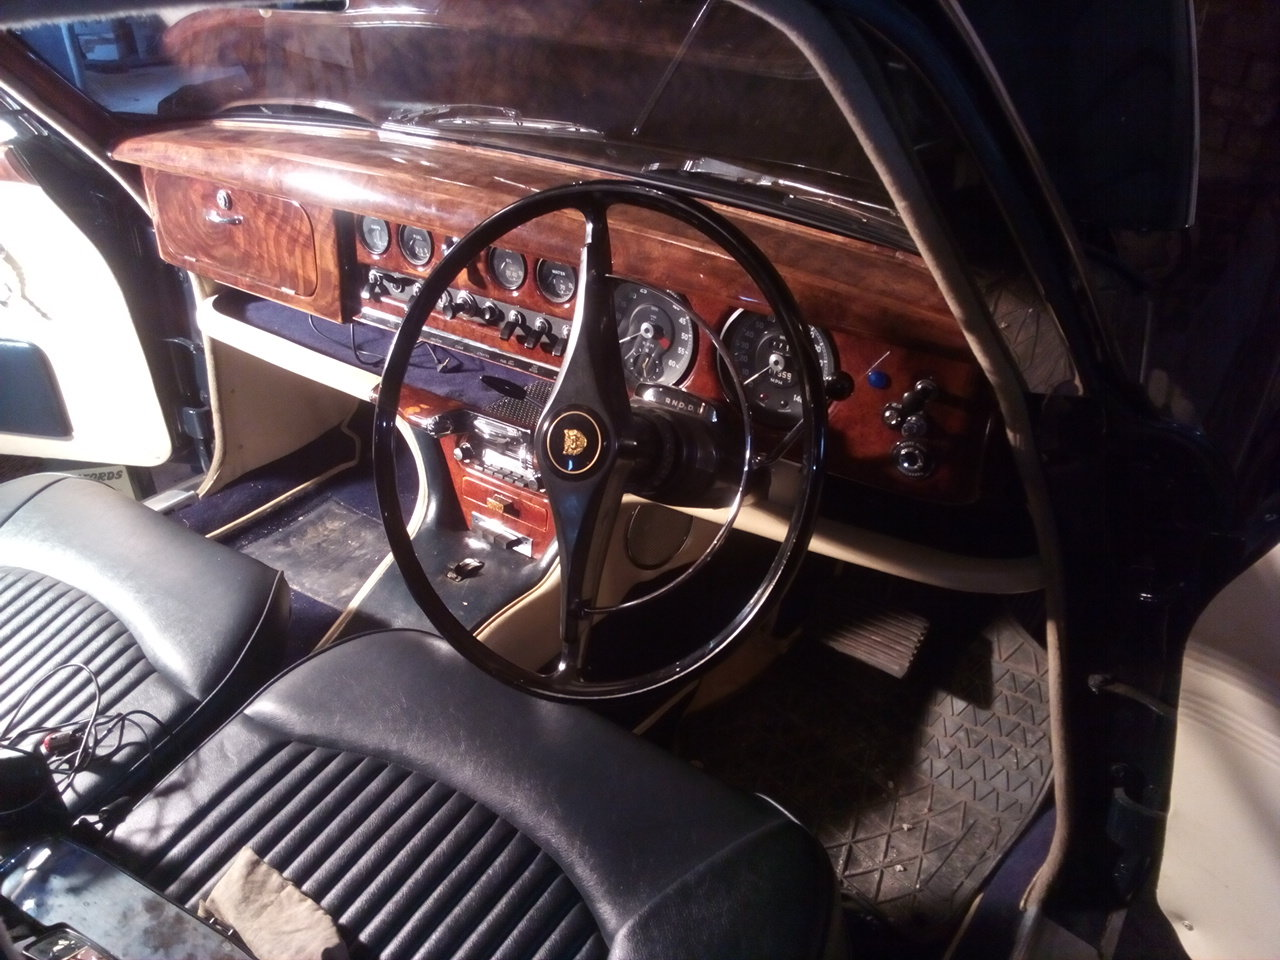 1968 Jaguar s-type 3.4 automatic – excellent cond For Sale (picture 5 of 6)